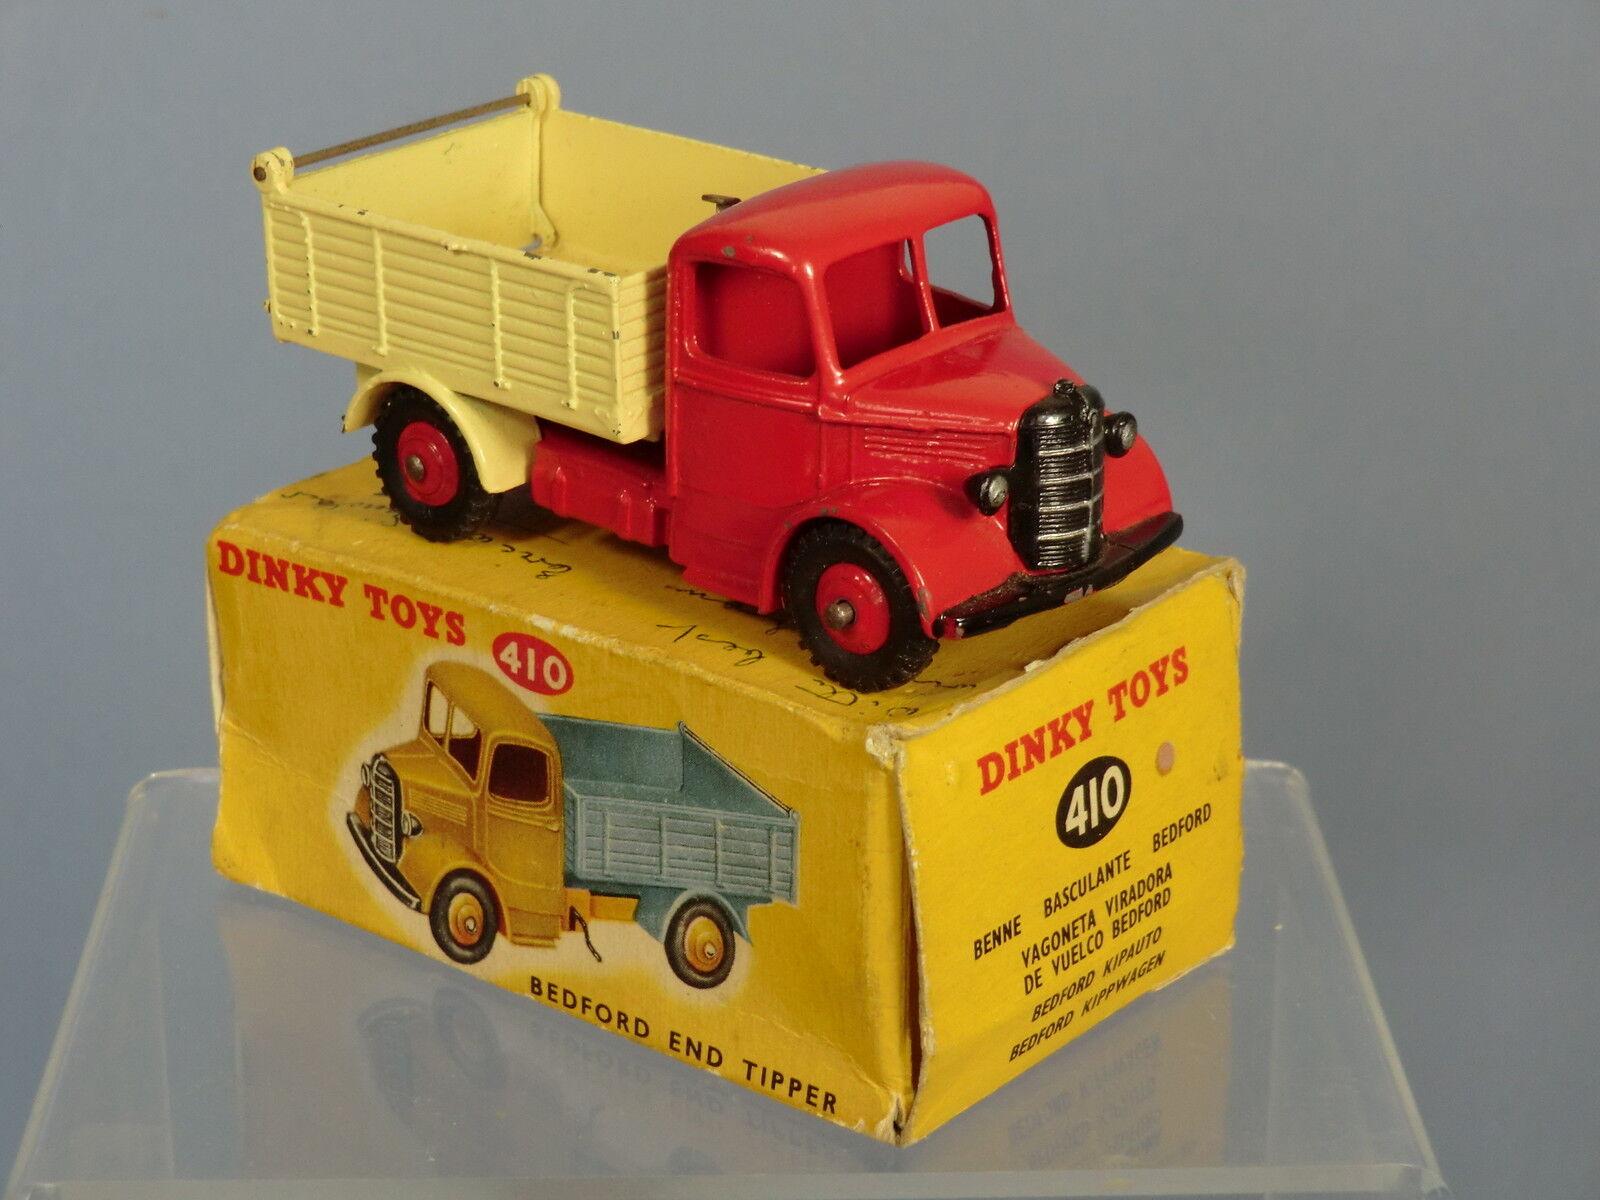 DINKY TOYS TOYS TOYS modello No.410 BEDFORD fine Ribaltamento Camion VN Nuovo di zecca con scatola 21de1d